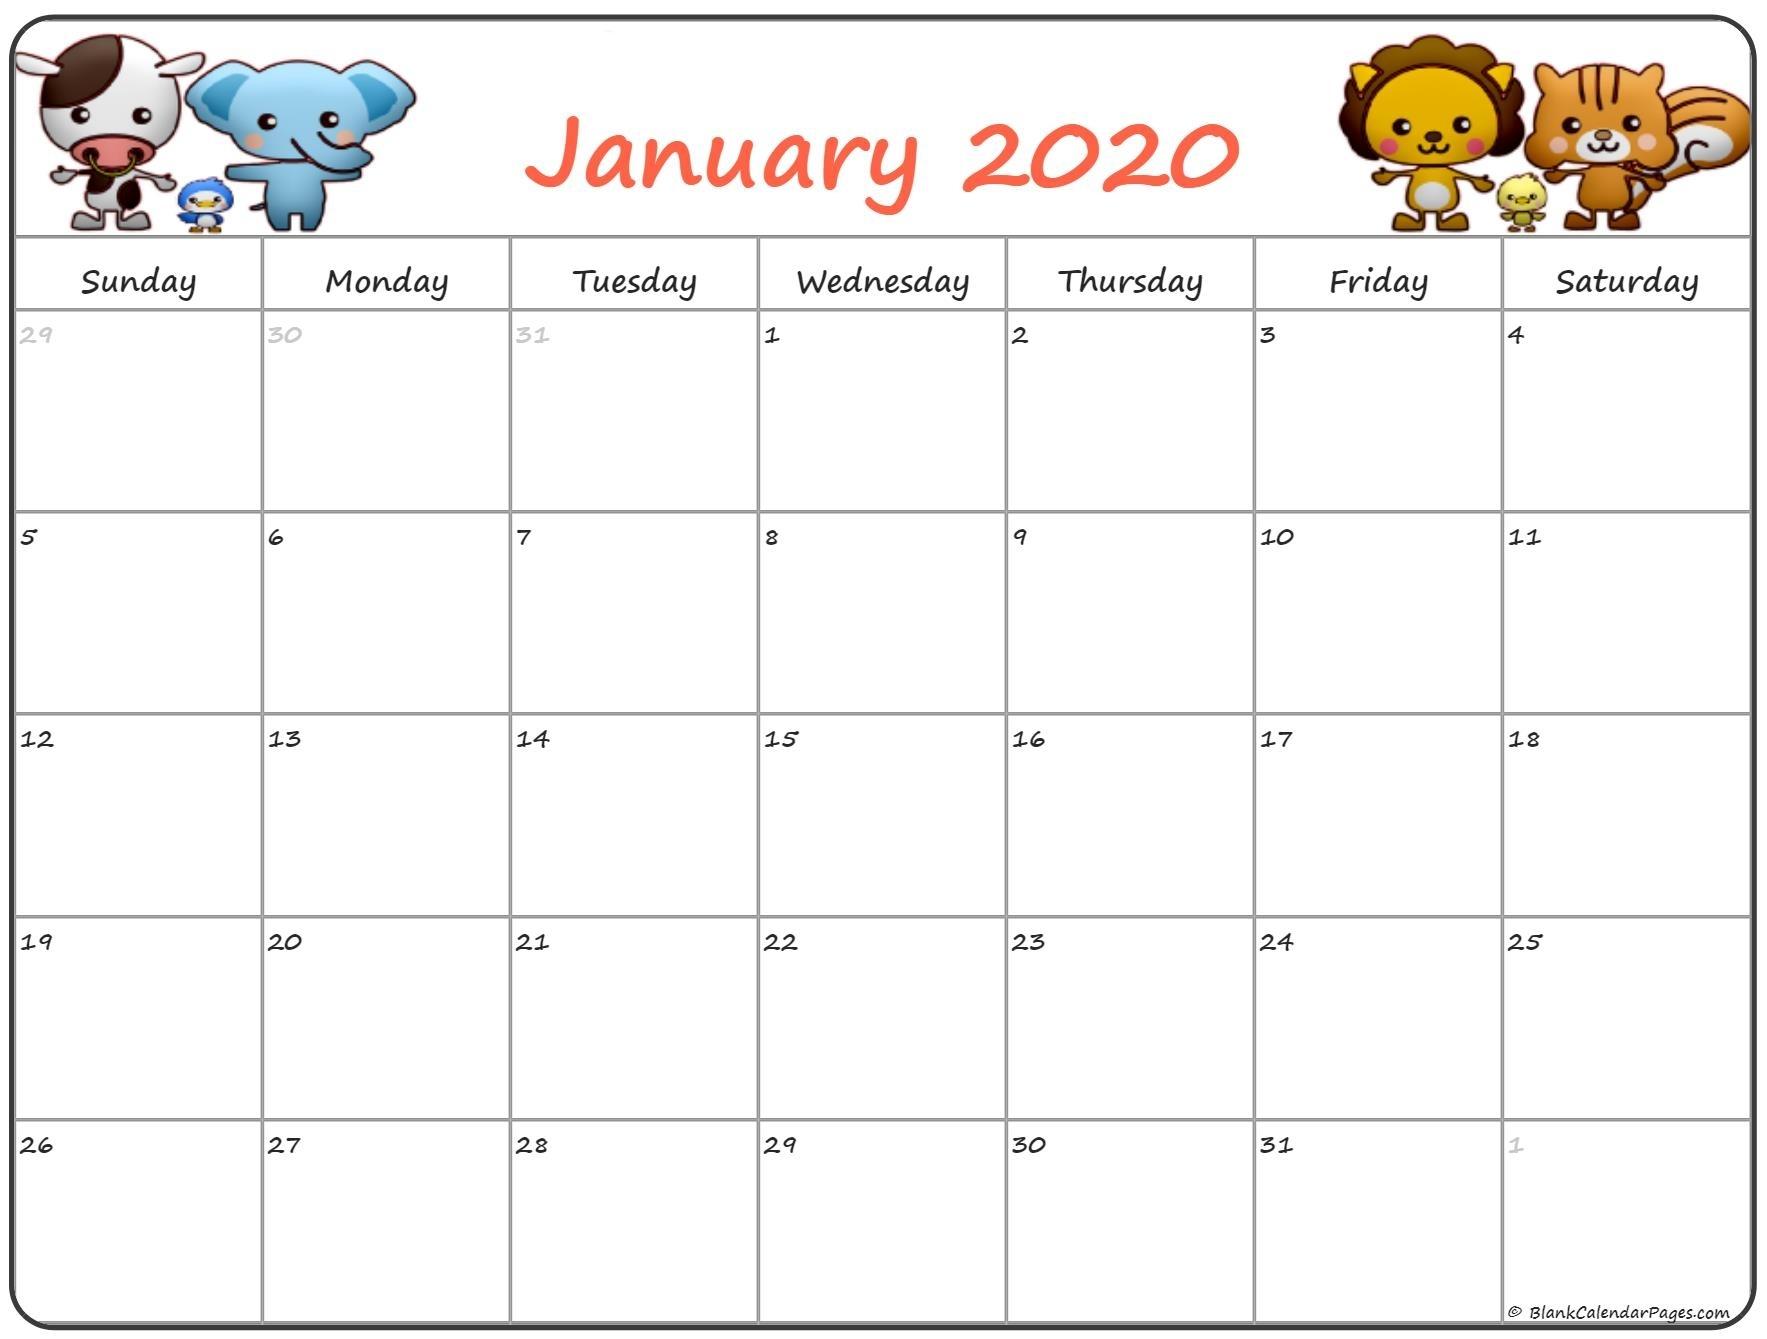 January 2020 Pregnancy Calendar | Fertility Calendar